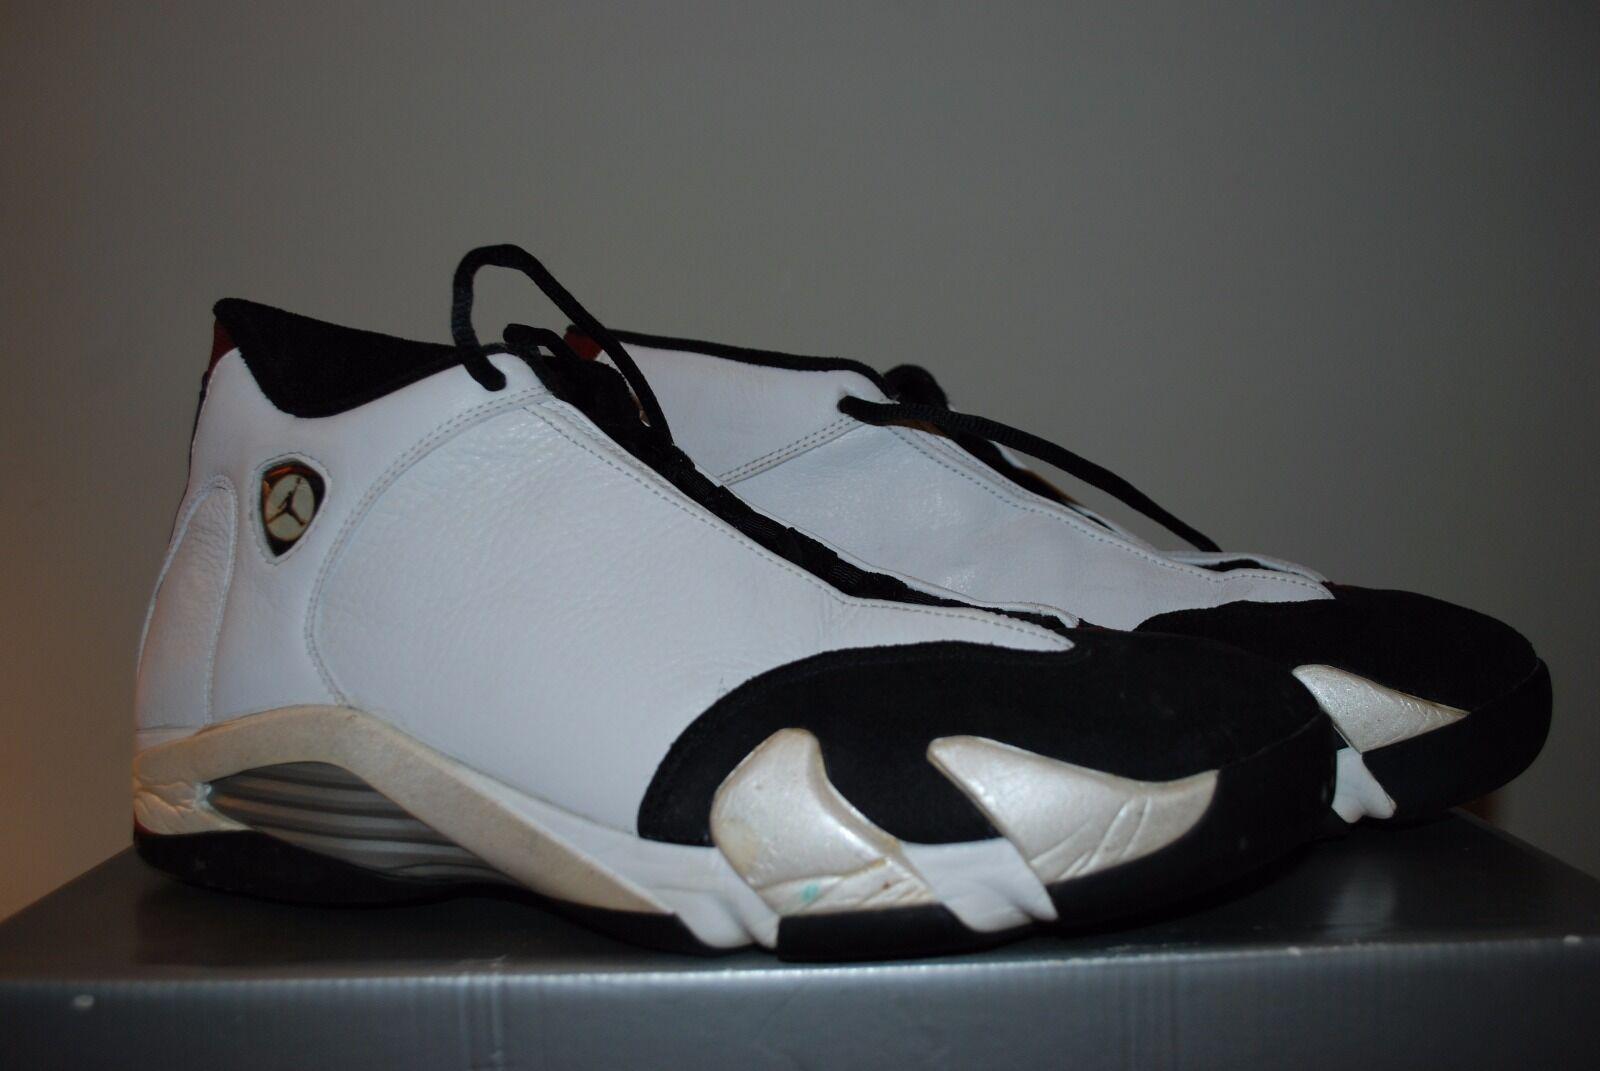 Nike Air Jordan 14 XIV OG Original White Size 12 136011-101   VERY RARE